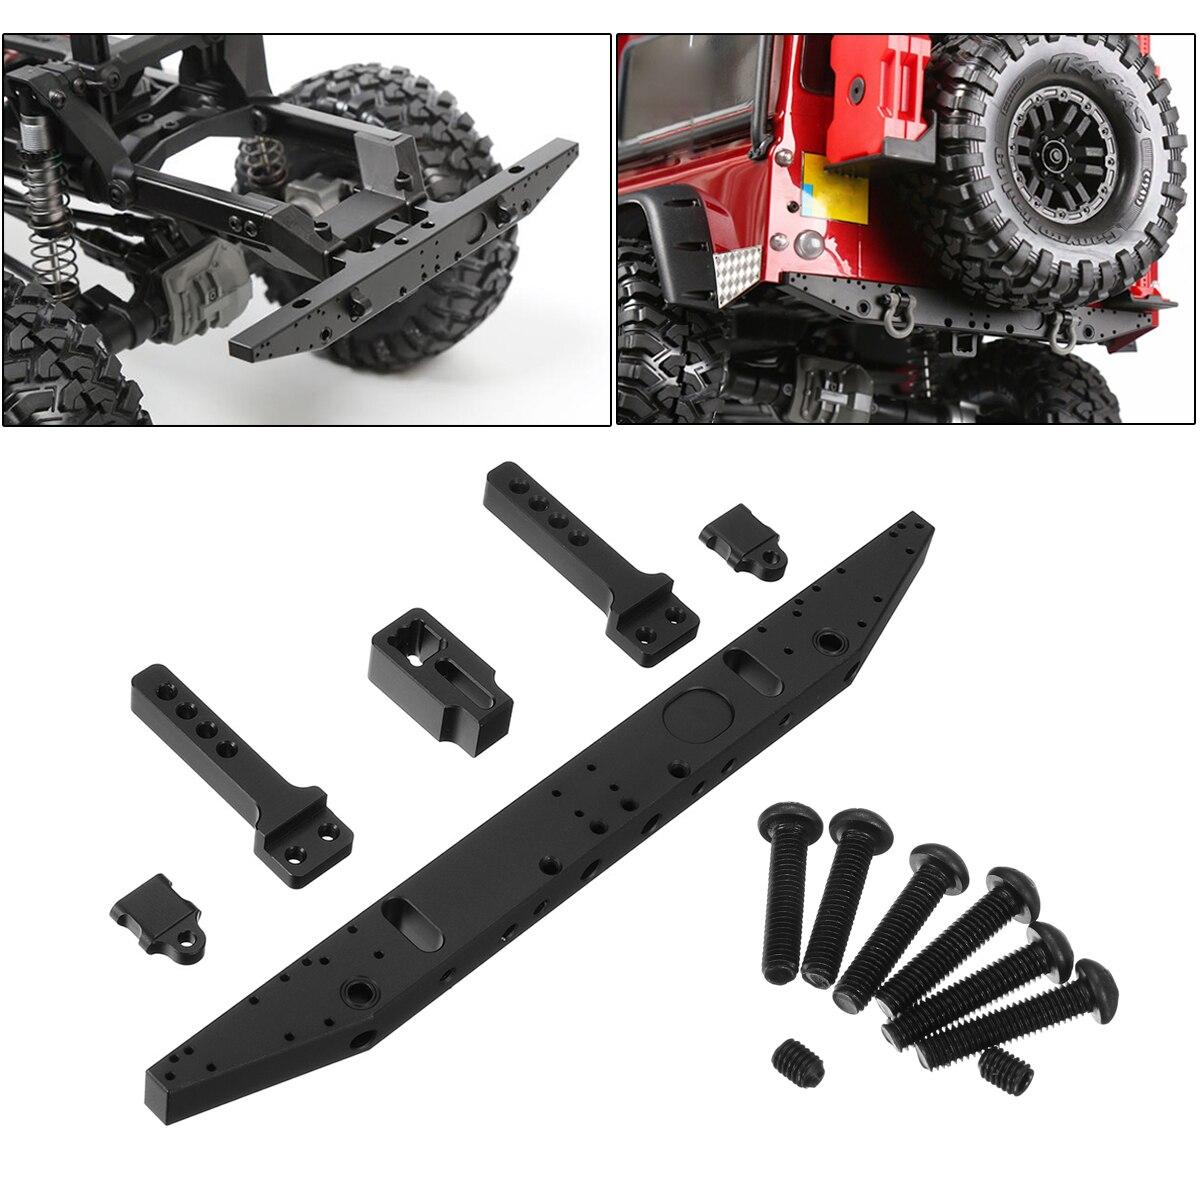 For 1/10 Traxxas TRX4 TRX-4 RC Crawler Aluminum Alloy Classic Rear Bumper Car Parts & Accs Cool Attractive Black Upgrade Auto mxfans rc 1 10 2 2 crawler car inflatable tires black alloy beadlock pack of 4